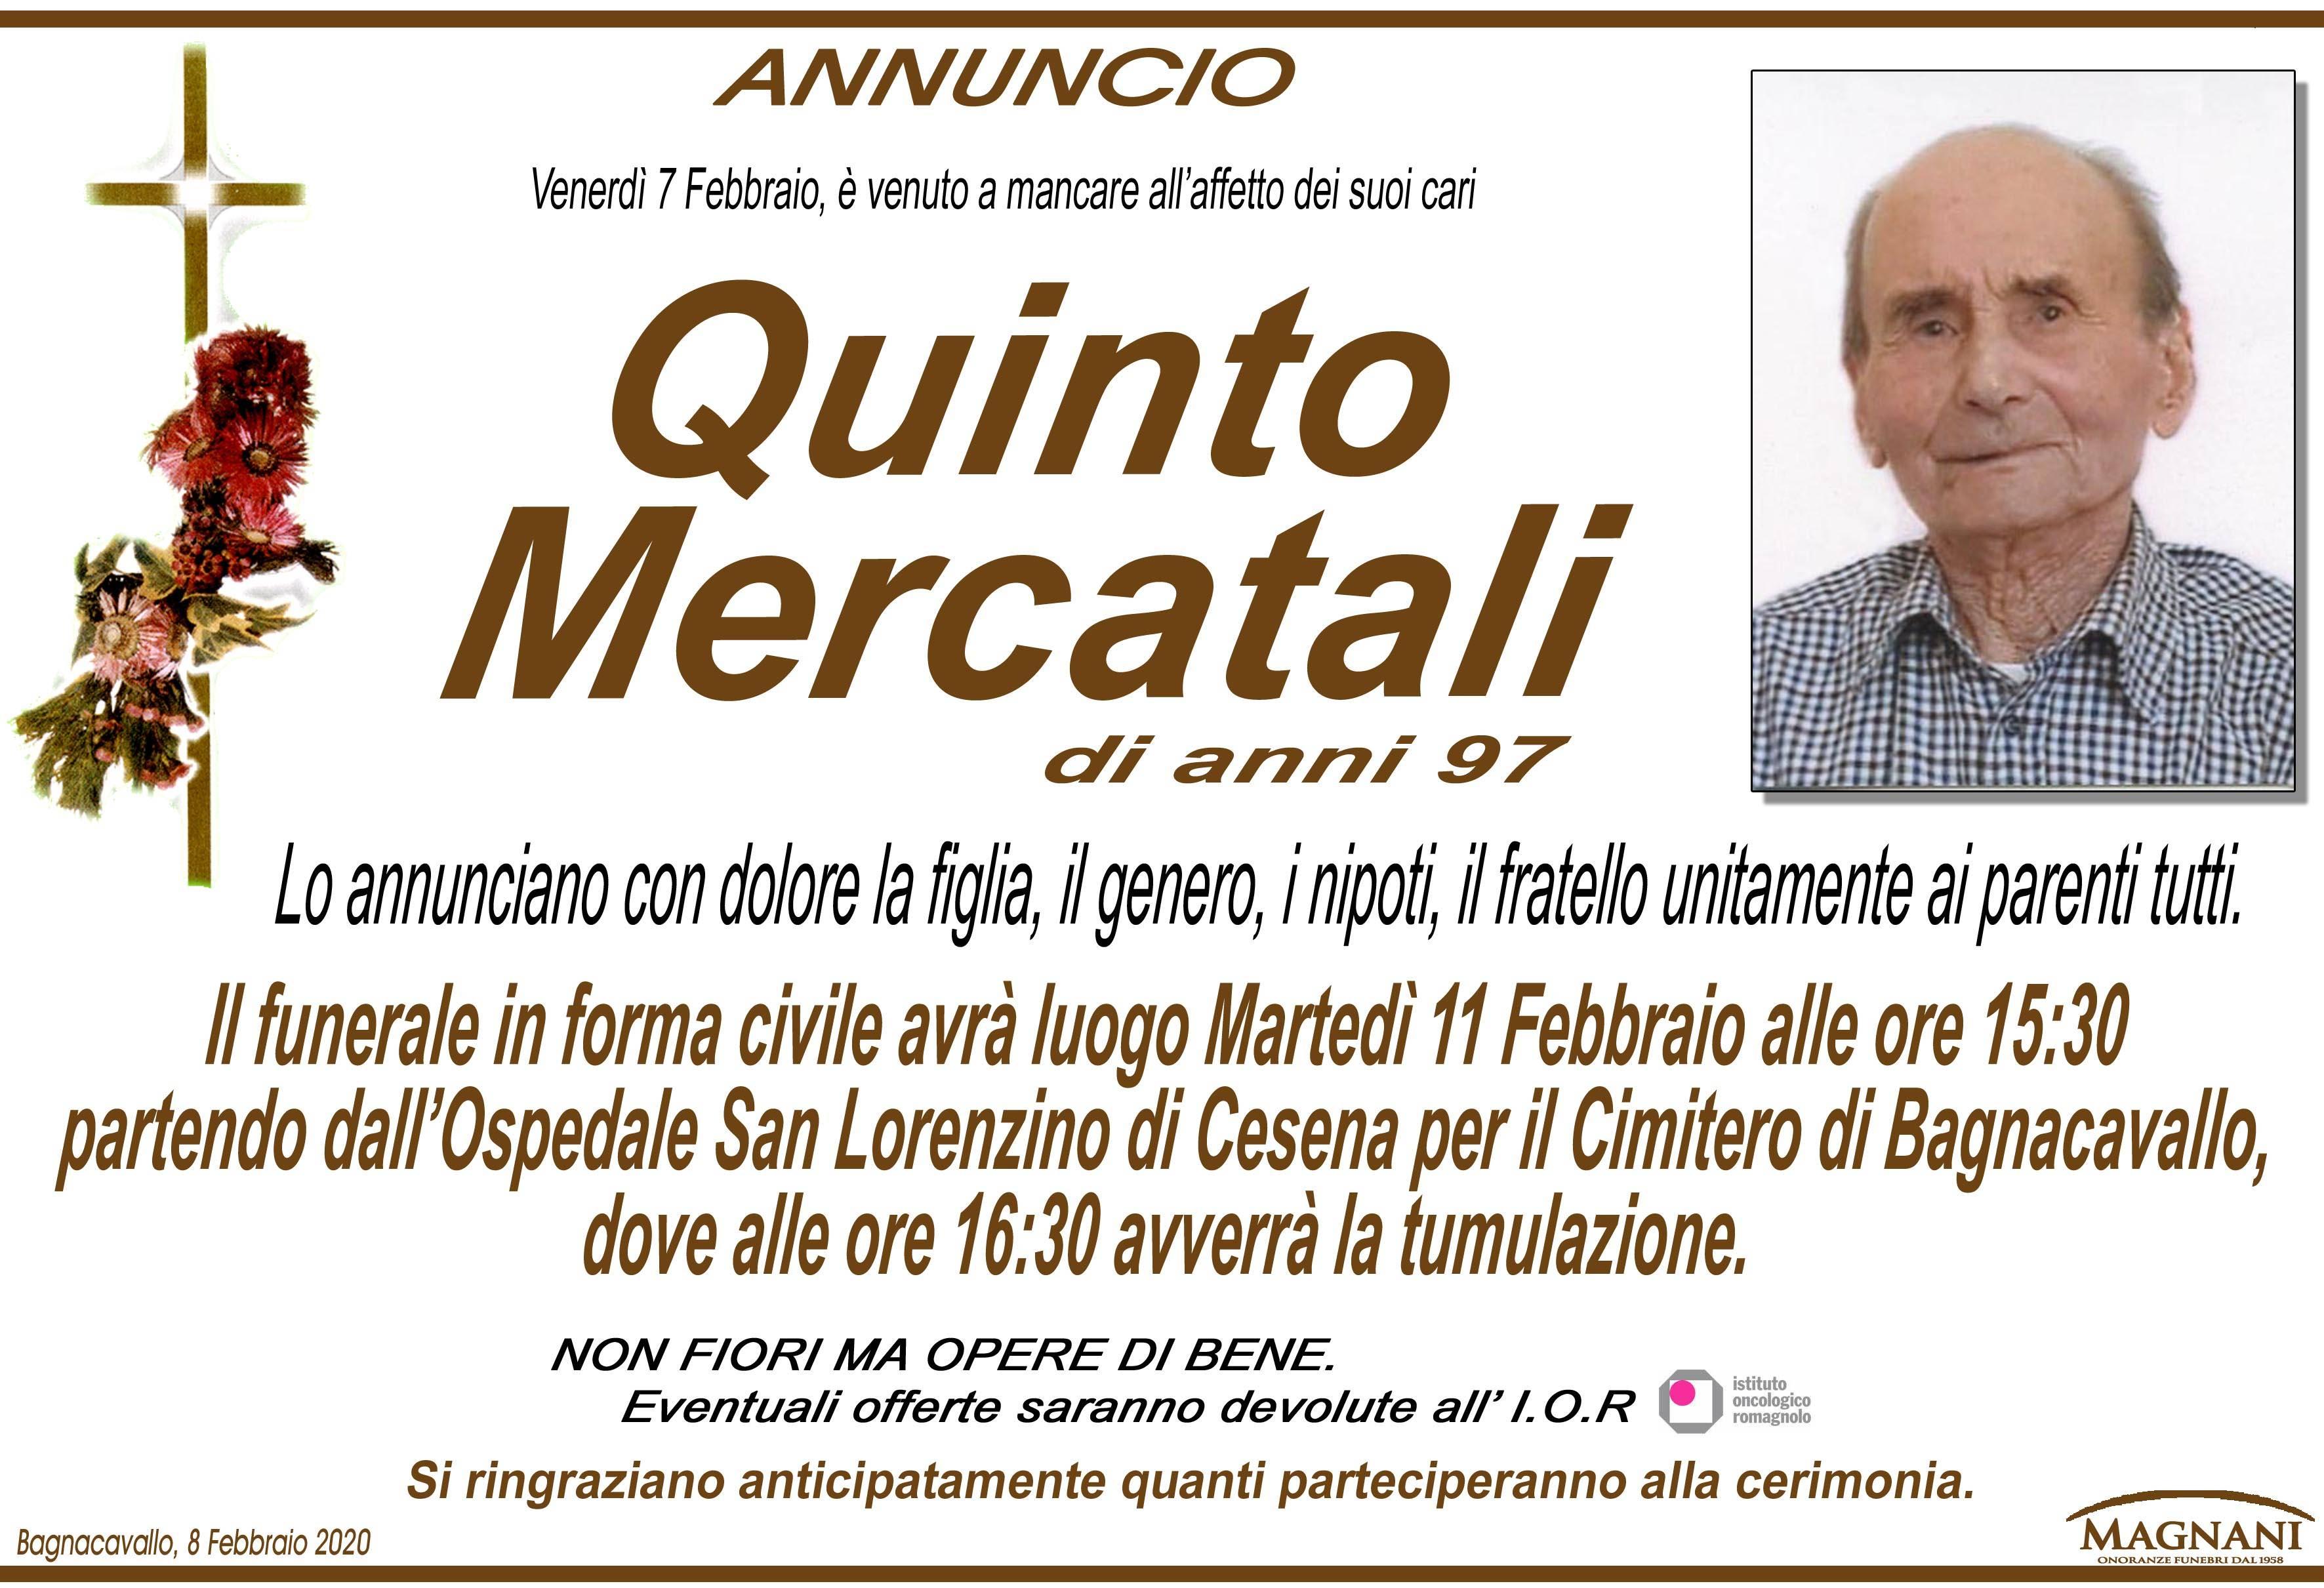 Quinto Mercatali